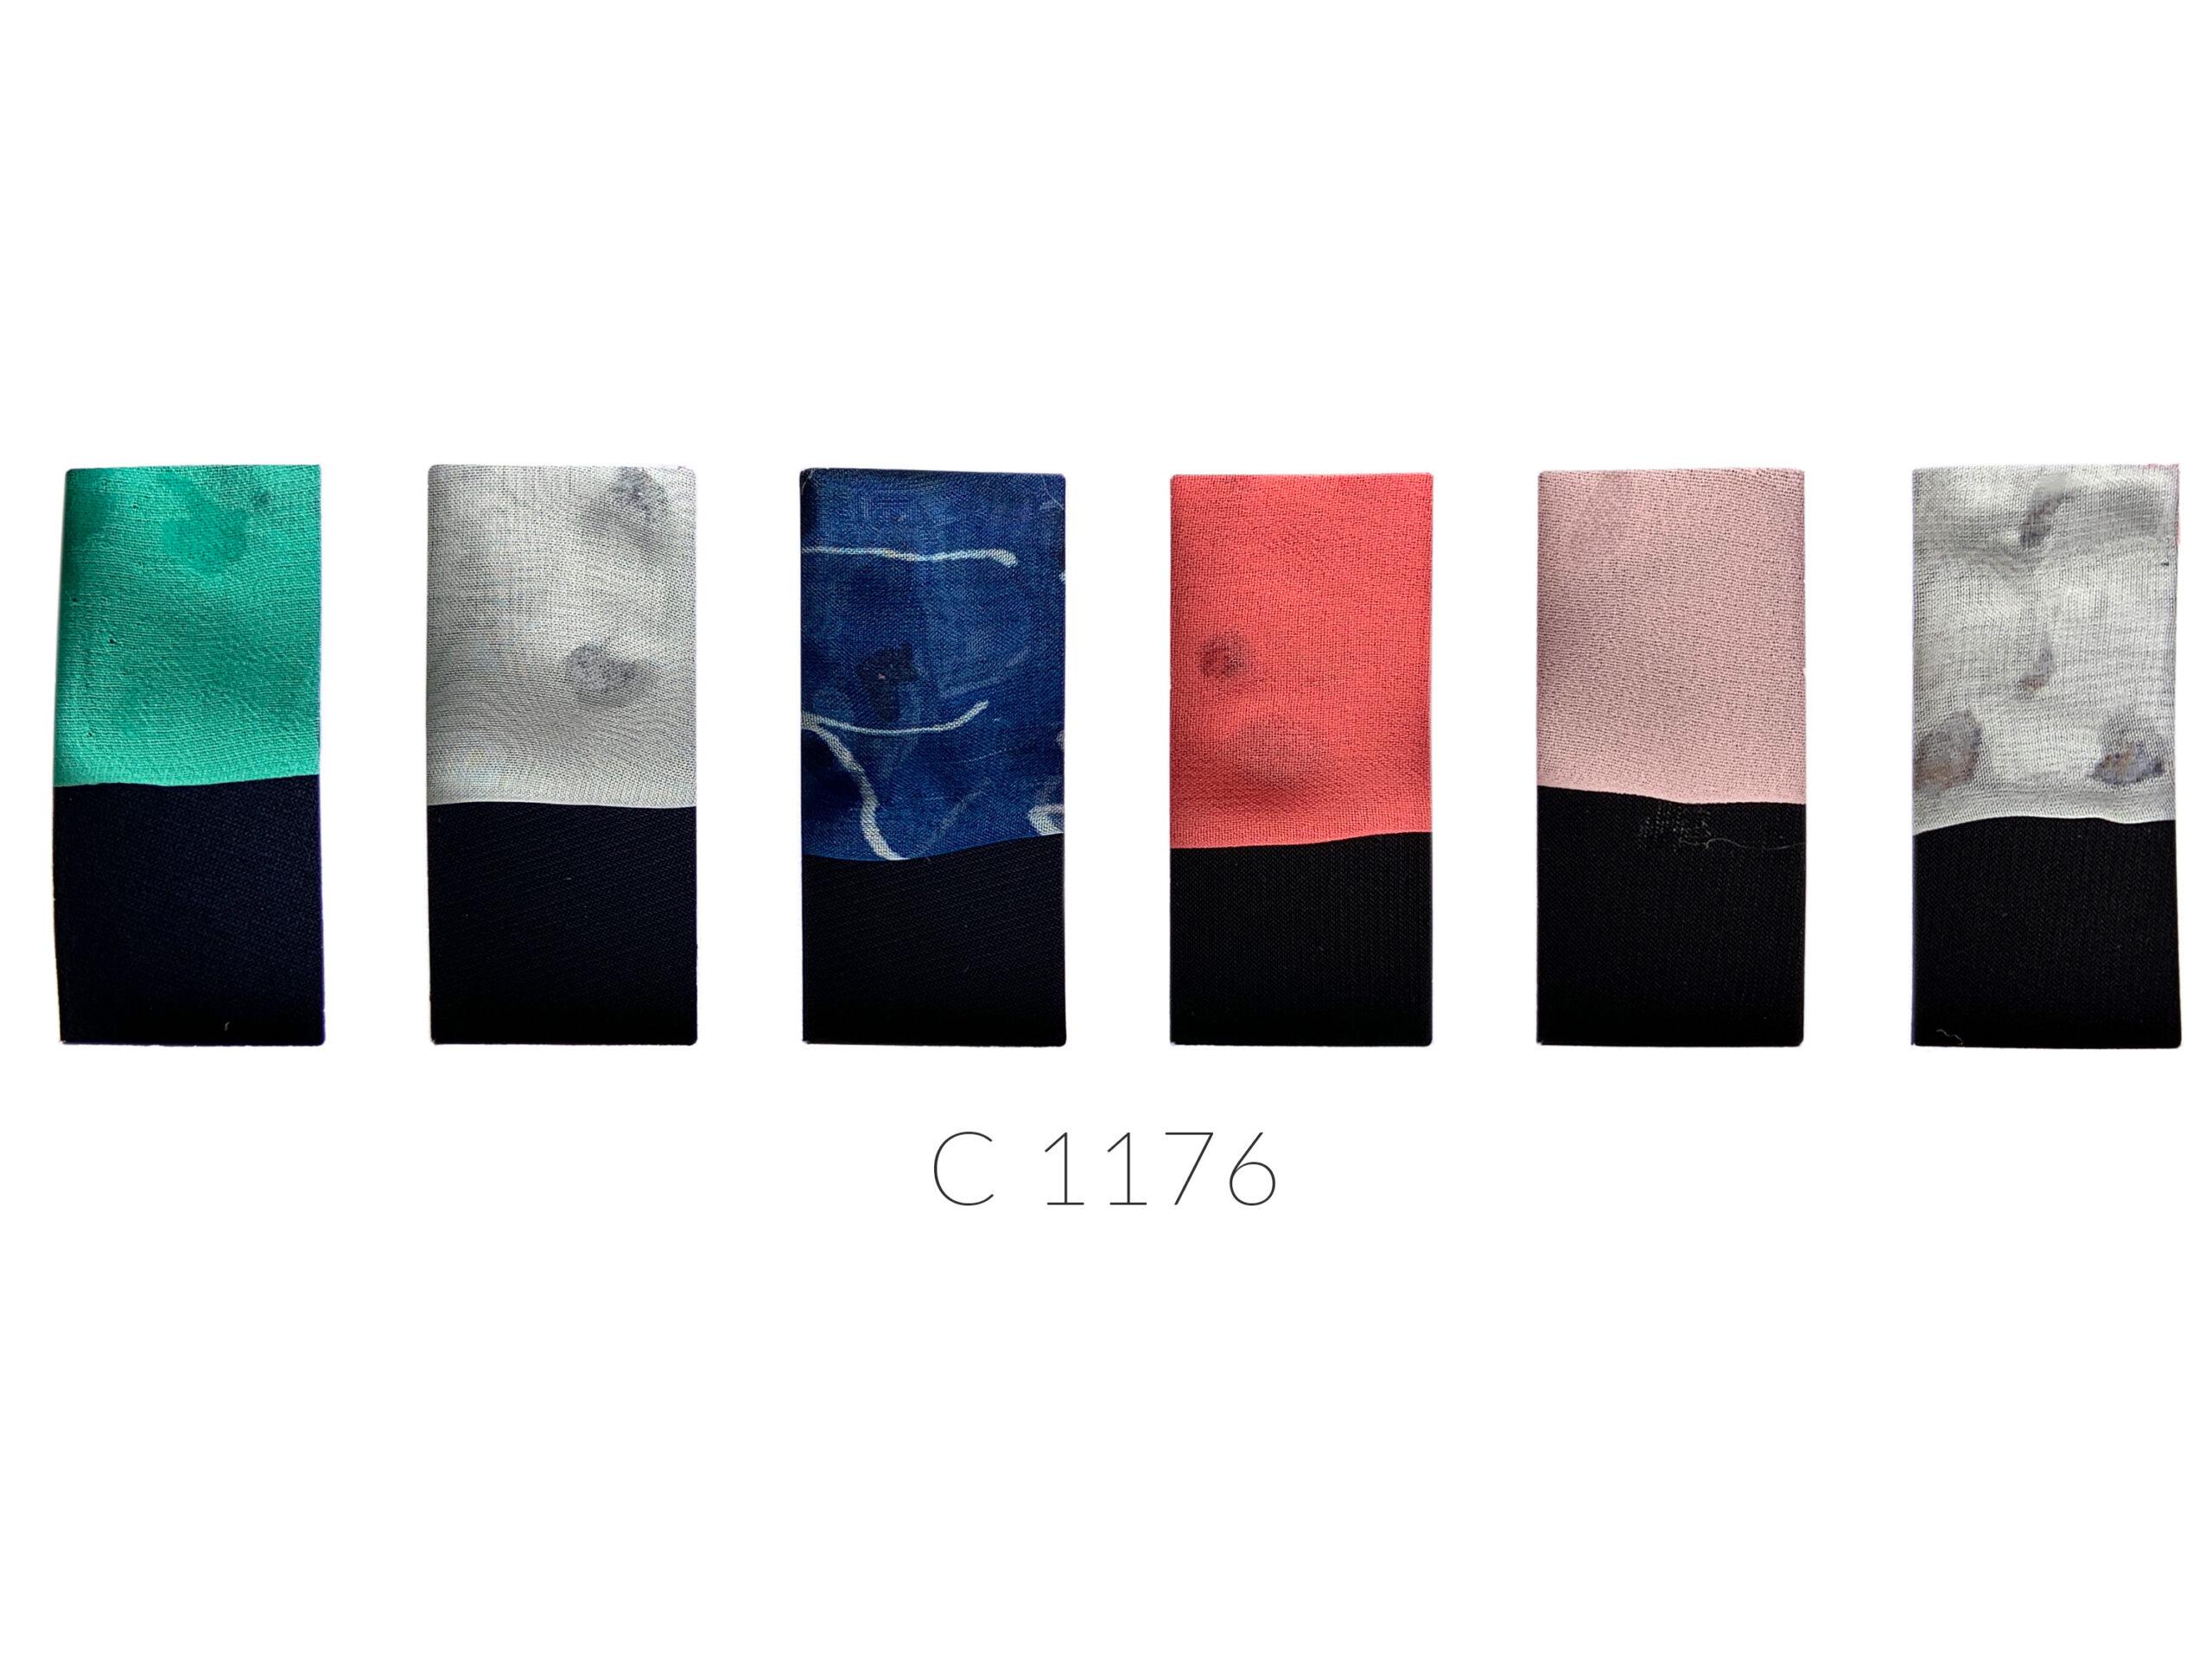 C1176